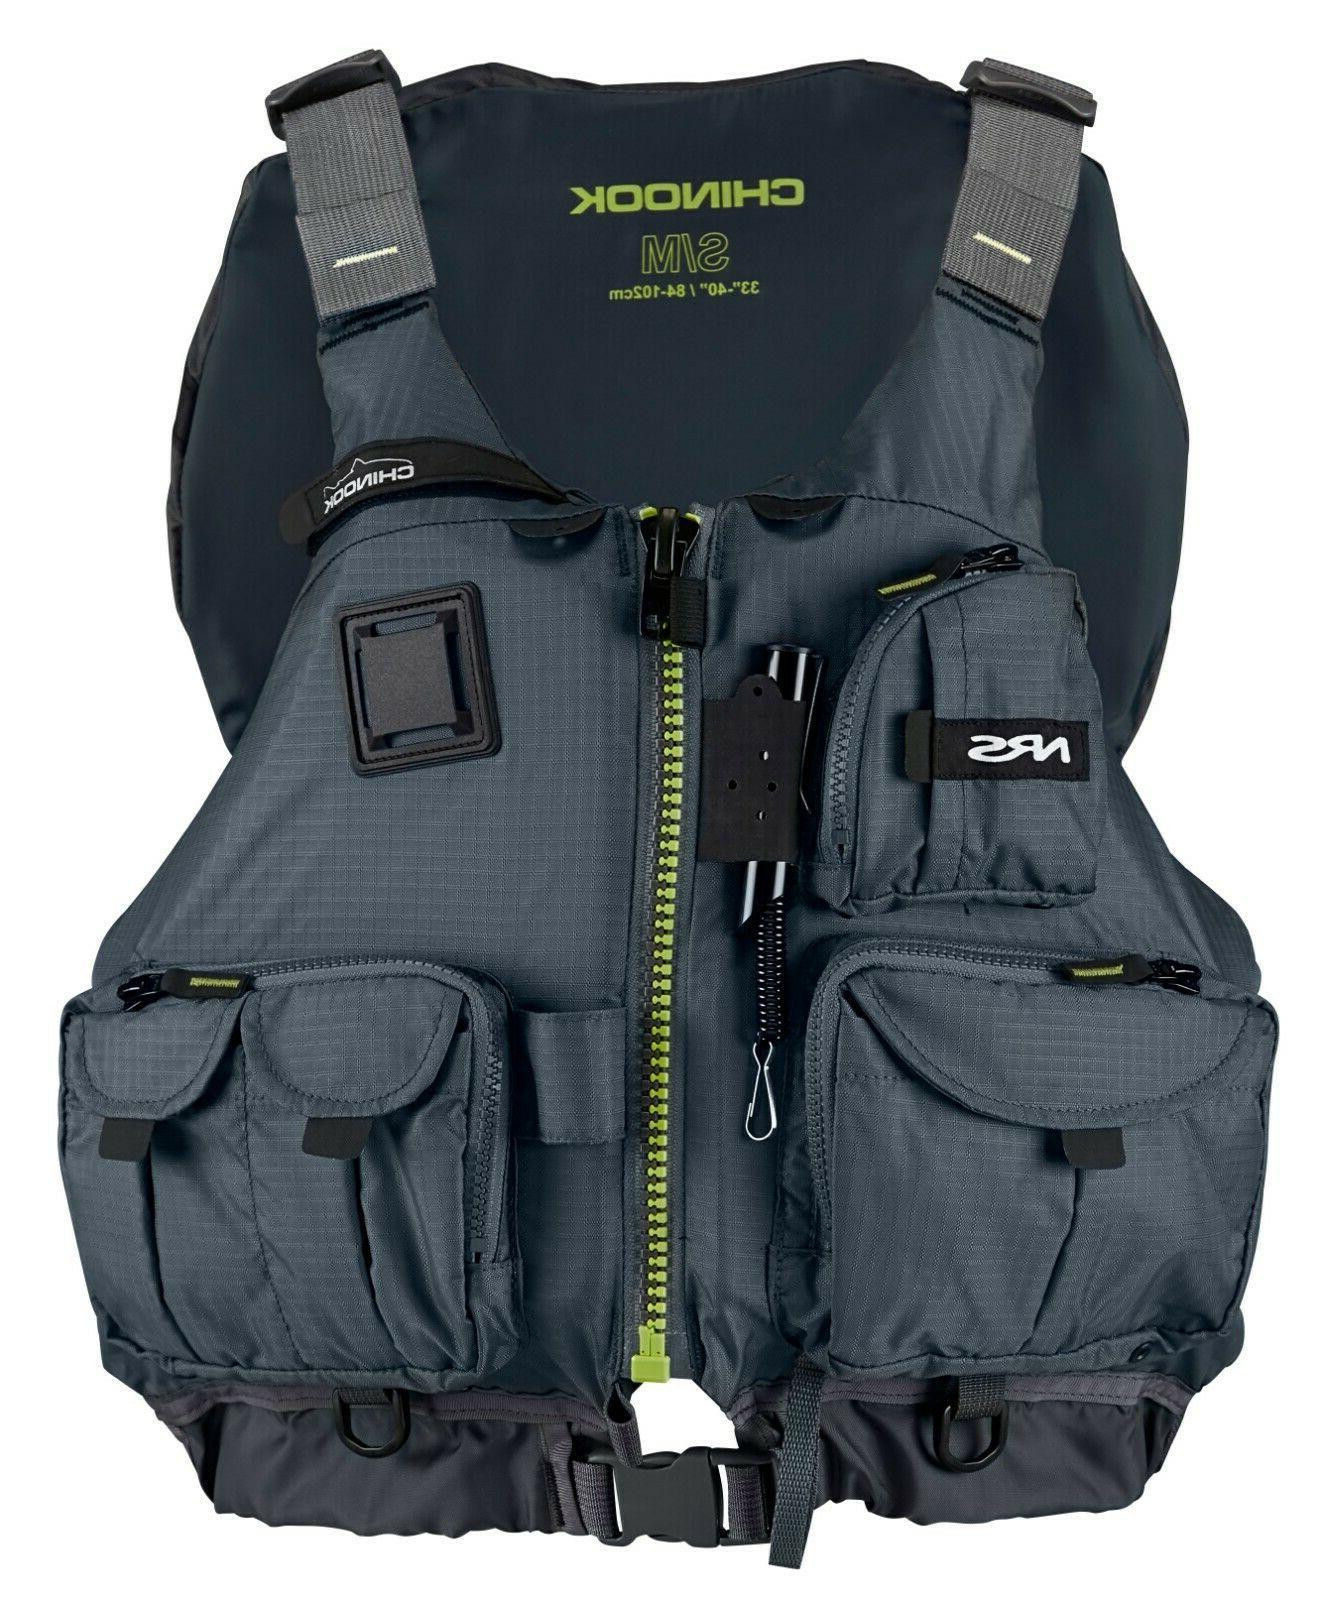 chinook fishing kayak lifejacket pfd charcoal s